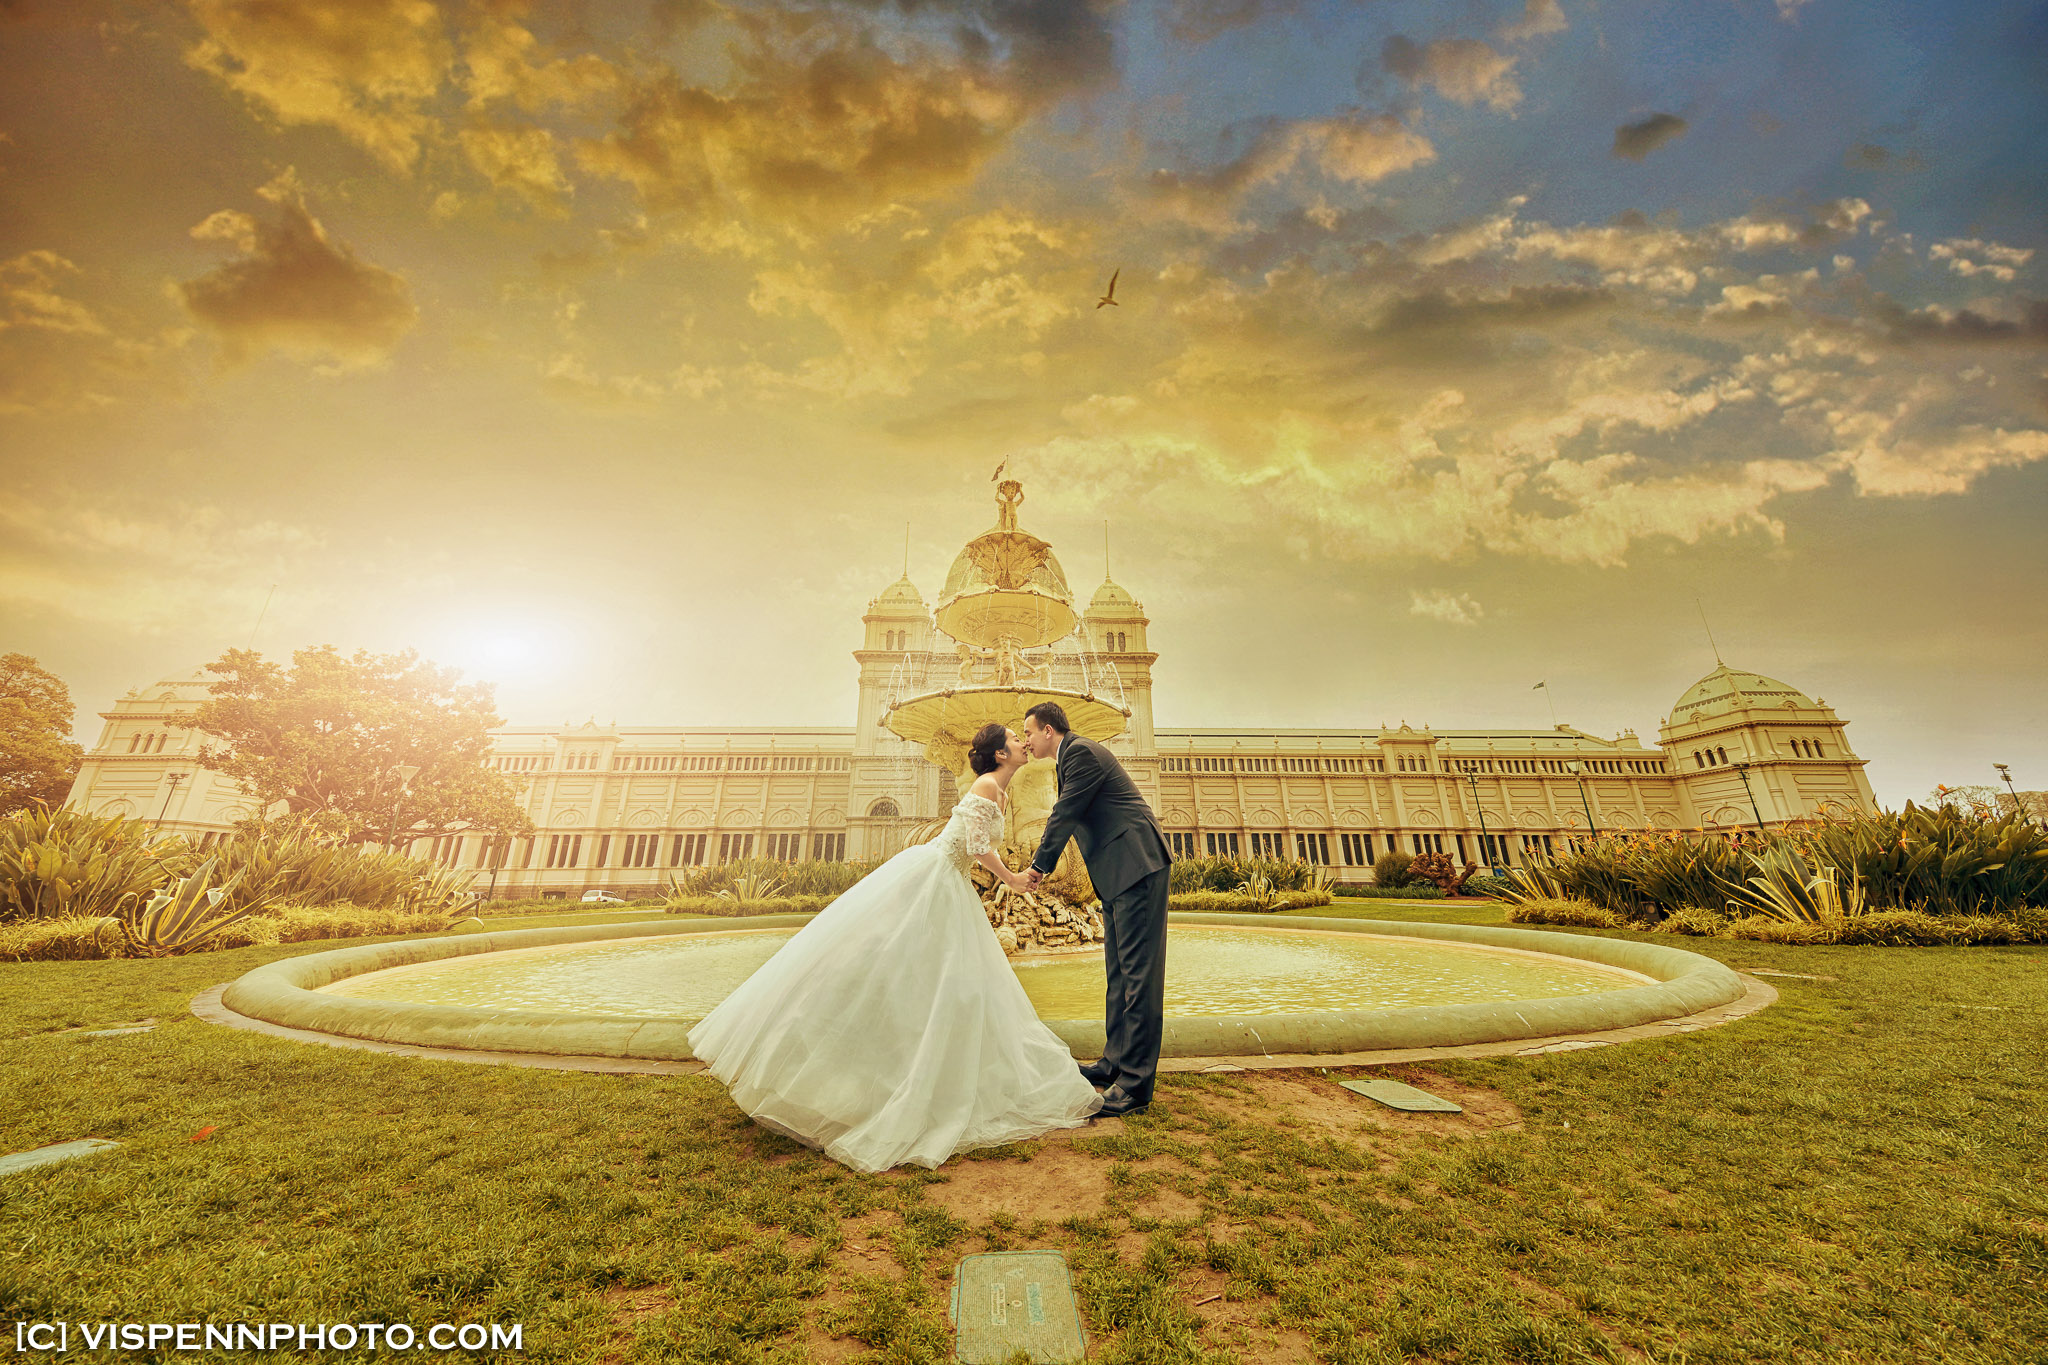 PRE WEDDING Photography Melbourne VISPENN 墨尔本 婚纱照 结婚照 婚纱摄影 VISPENN XXD 1929 1